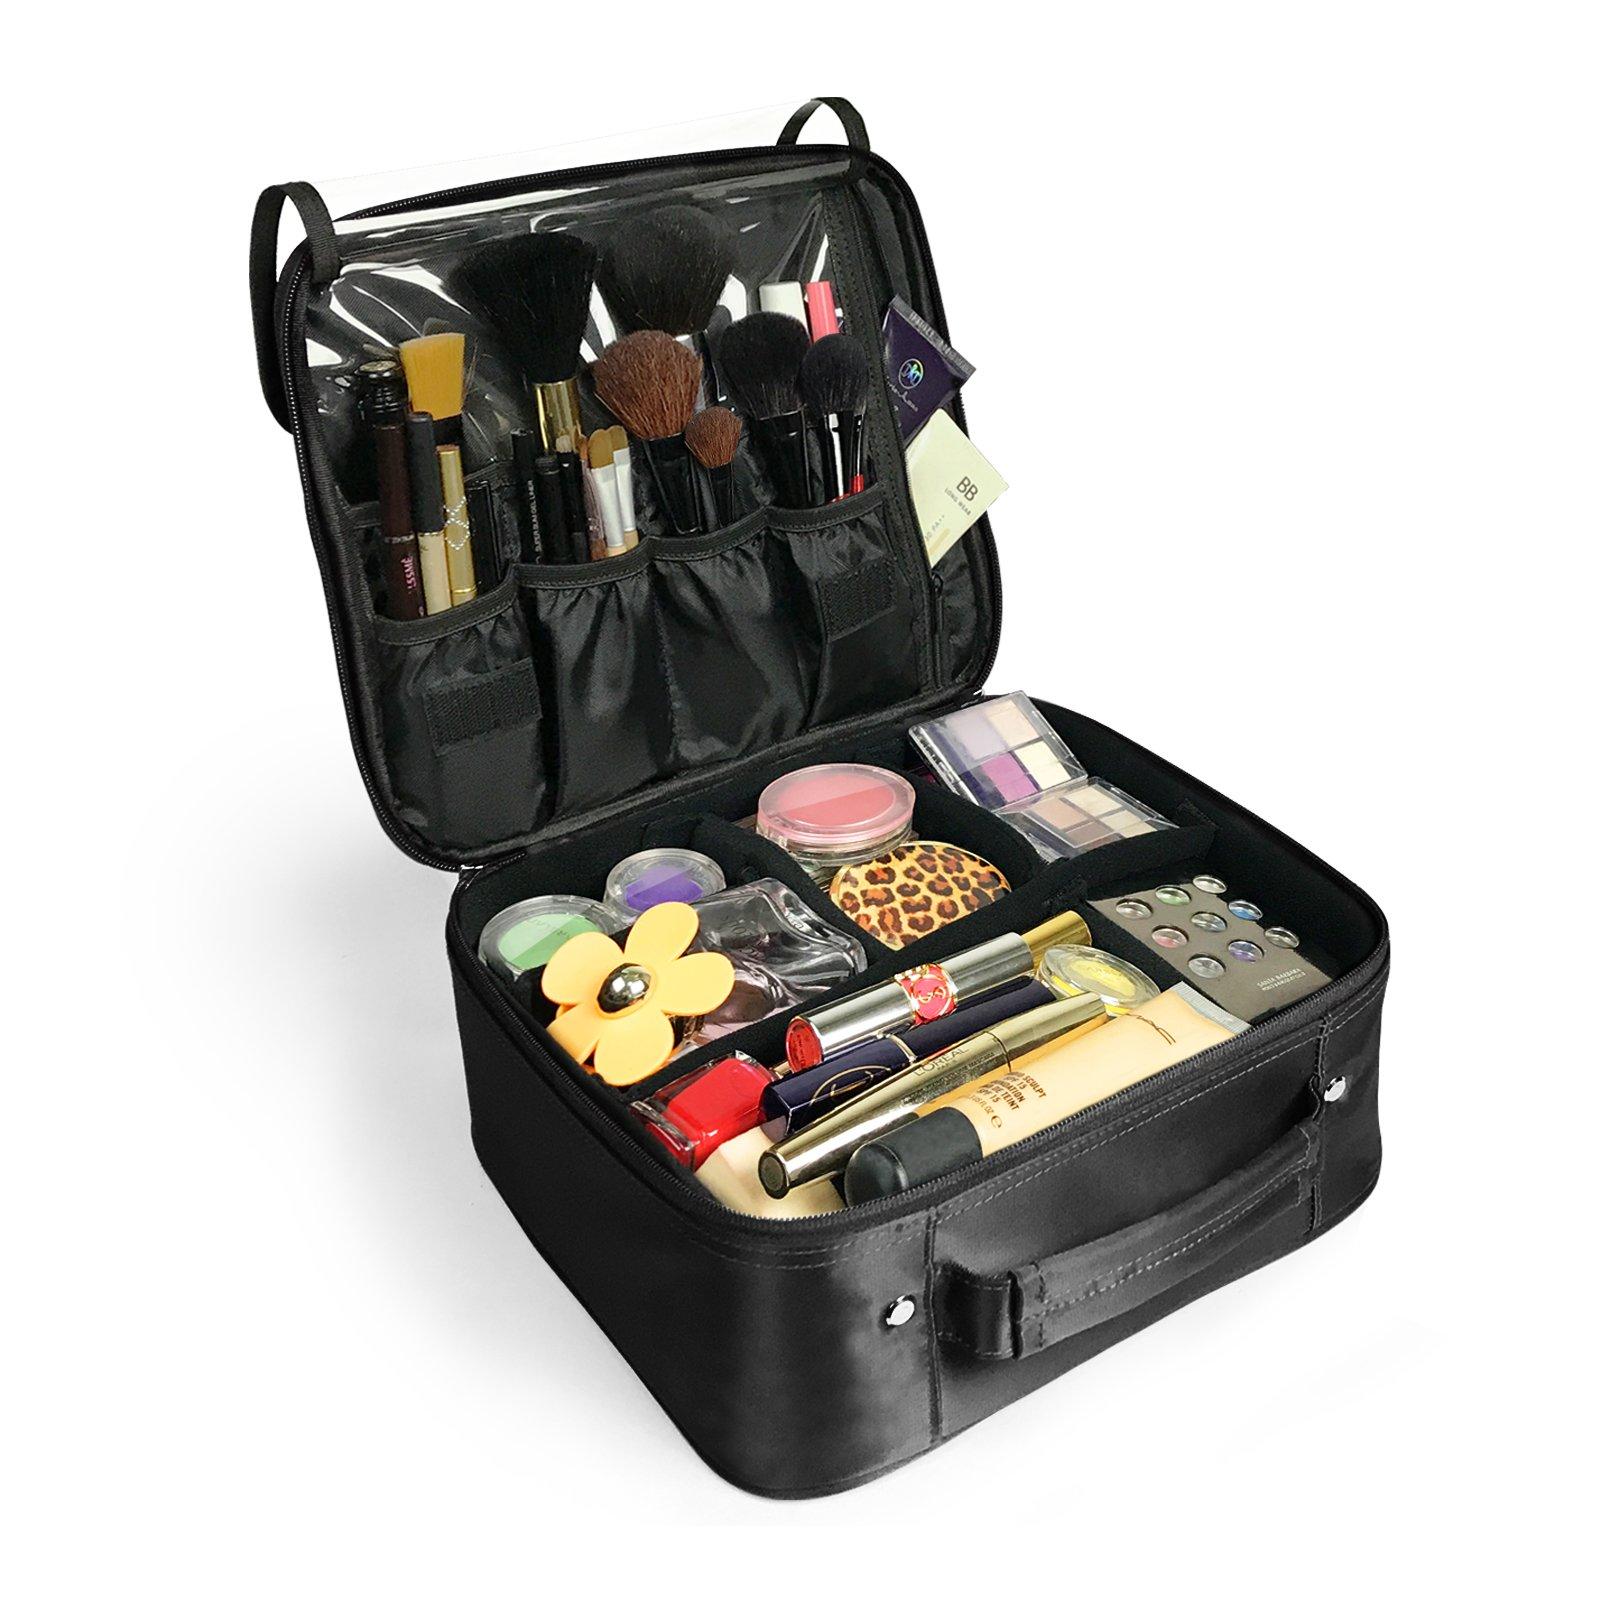 Becko Black Portable Travel Cosmetic Makeup Bag / Toiletry bag (Black)